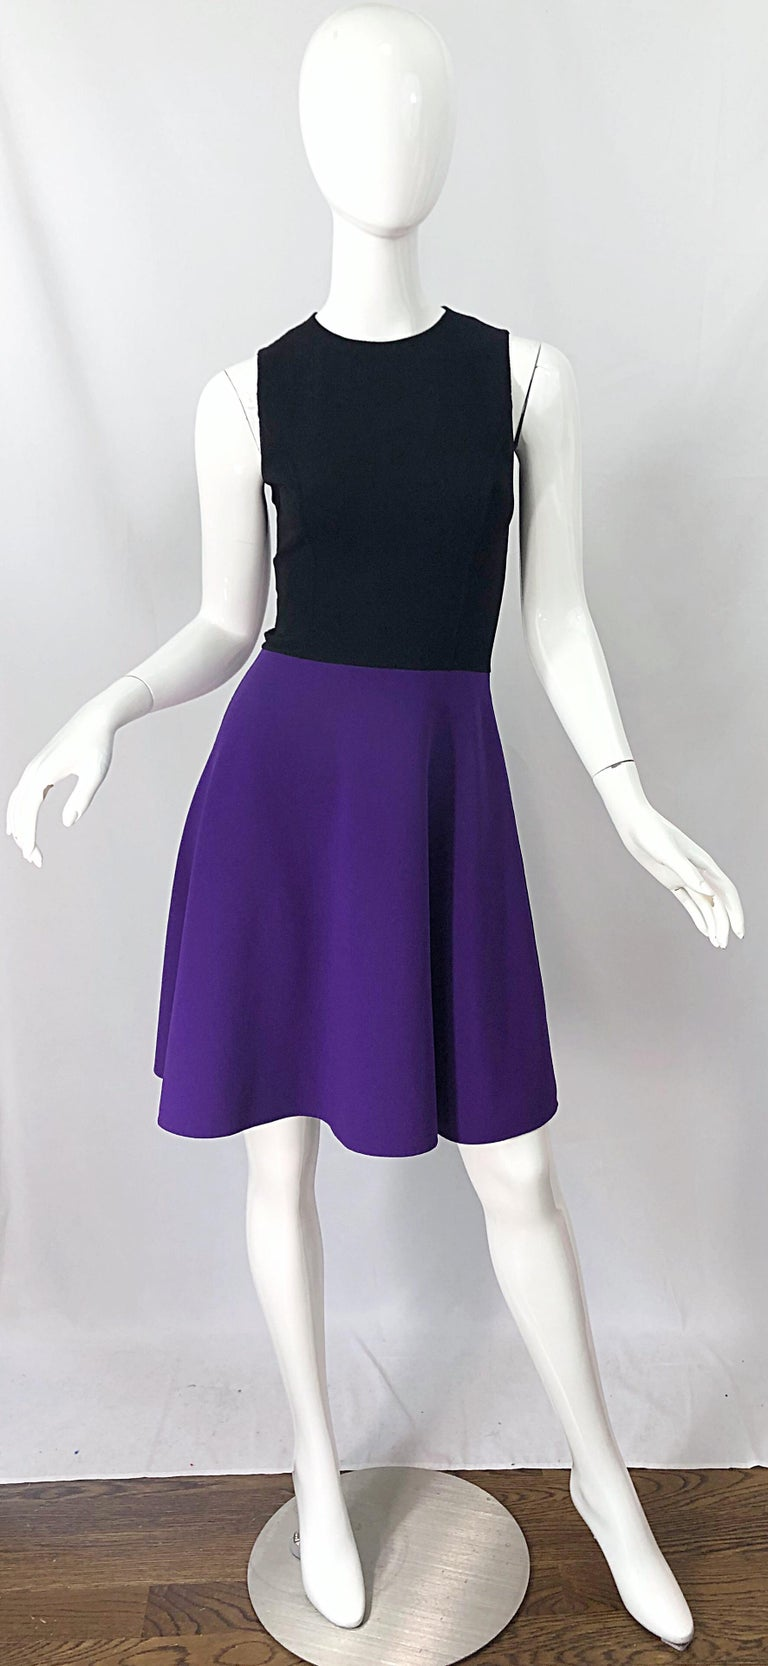 Michael Kors Collection Size 2 / 4 Purple + Black Color Block Sleeveles Dress For Sale 6